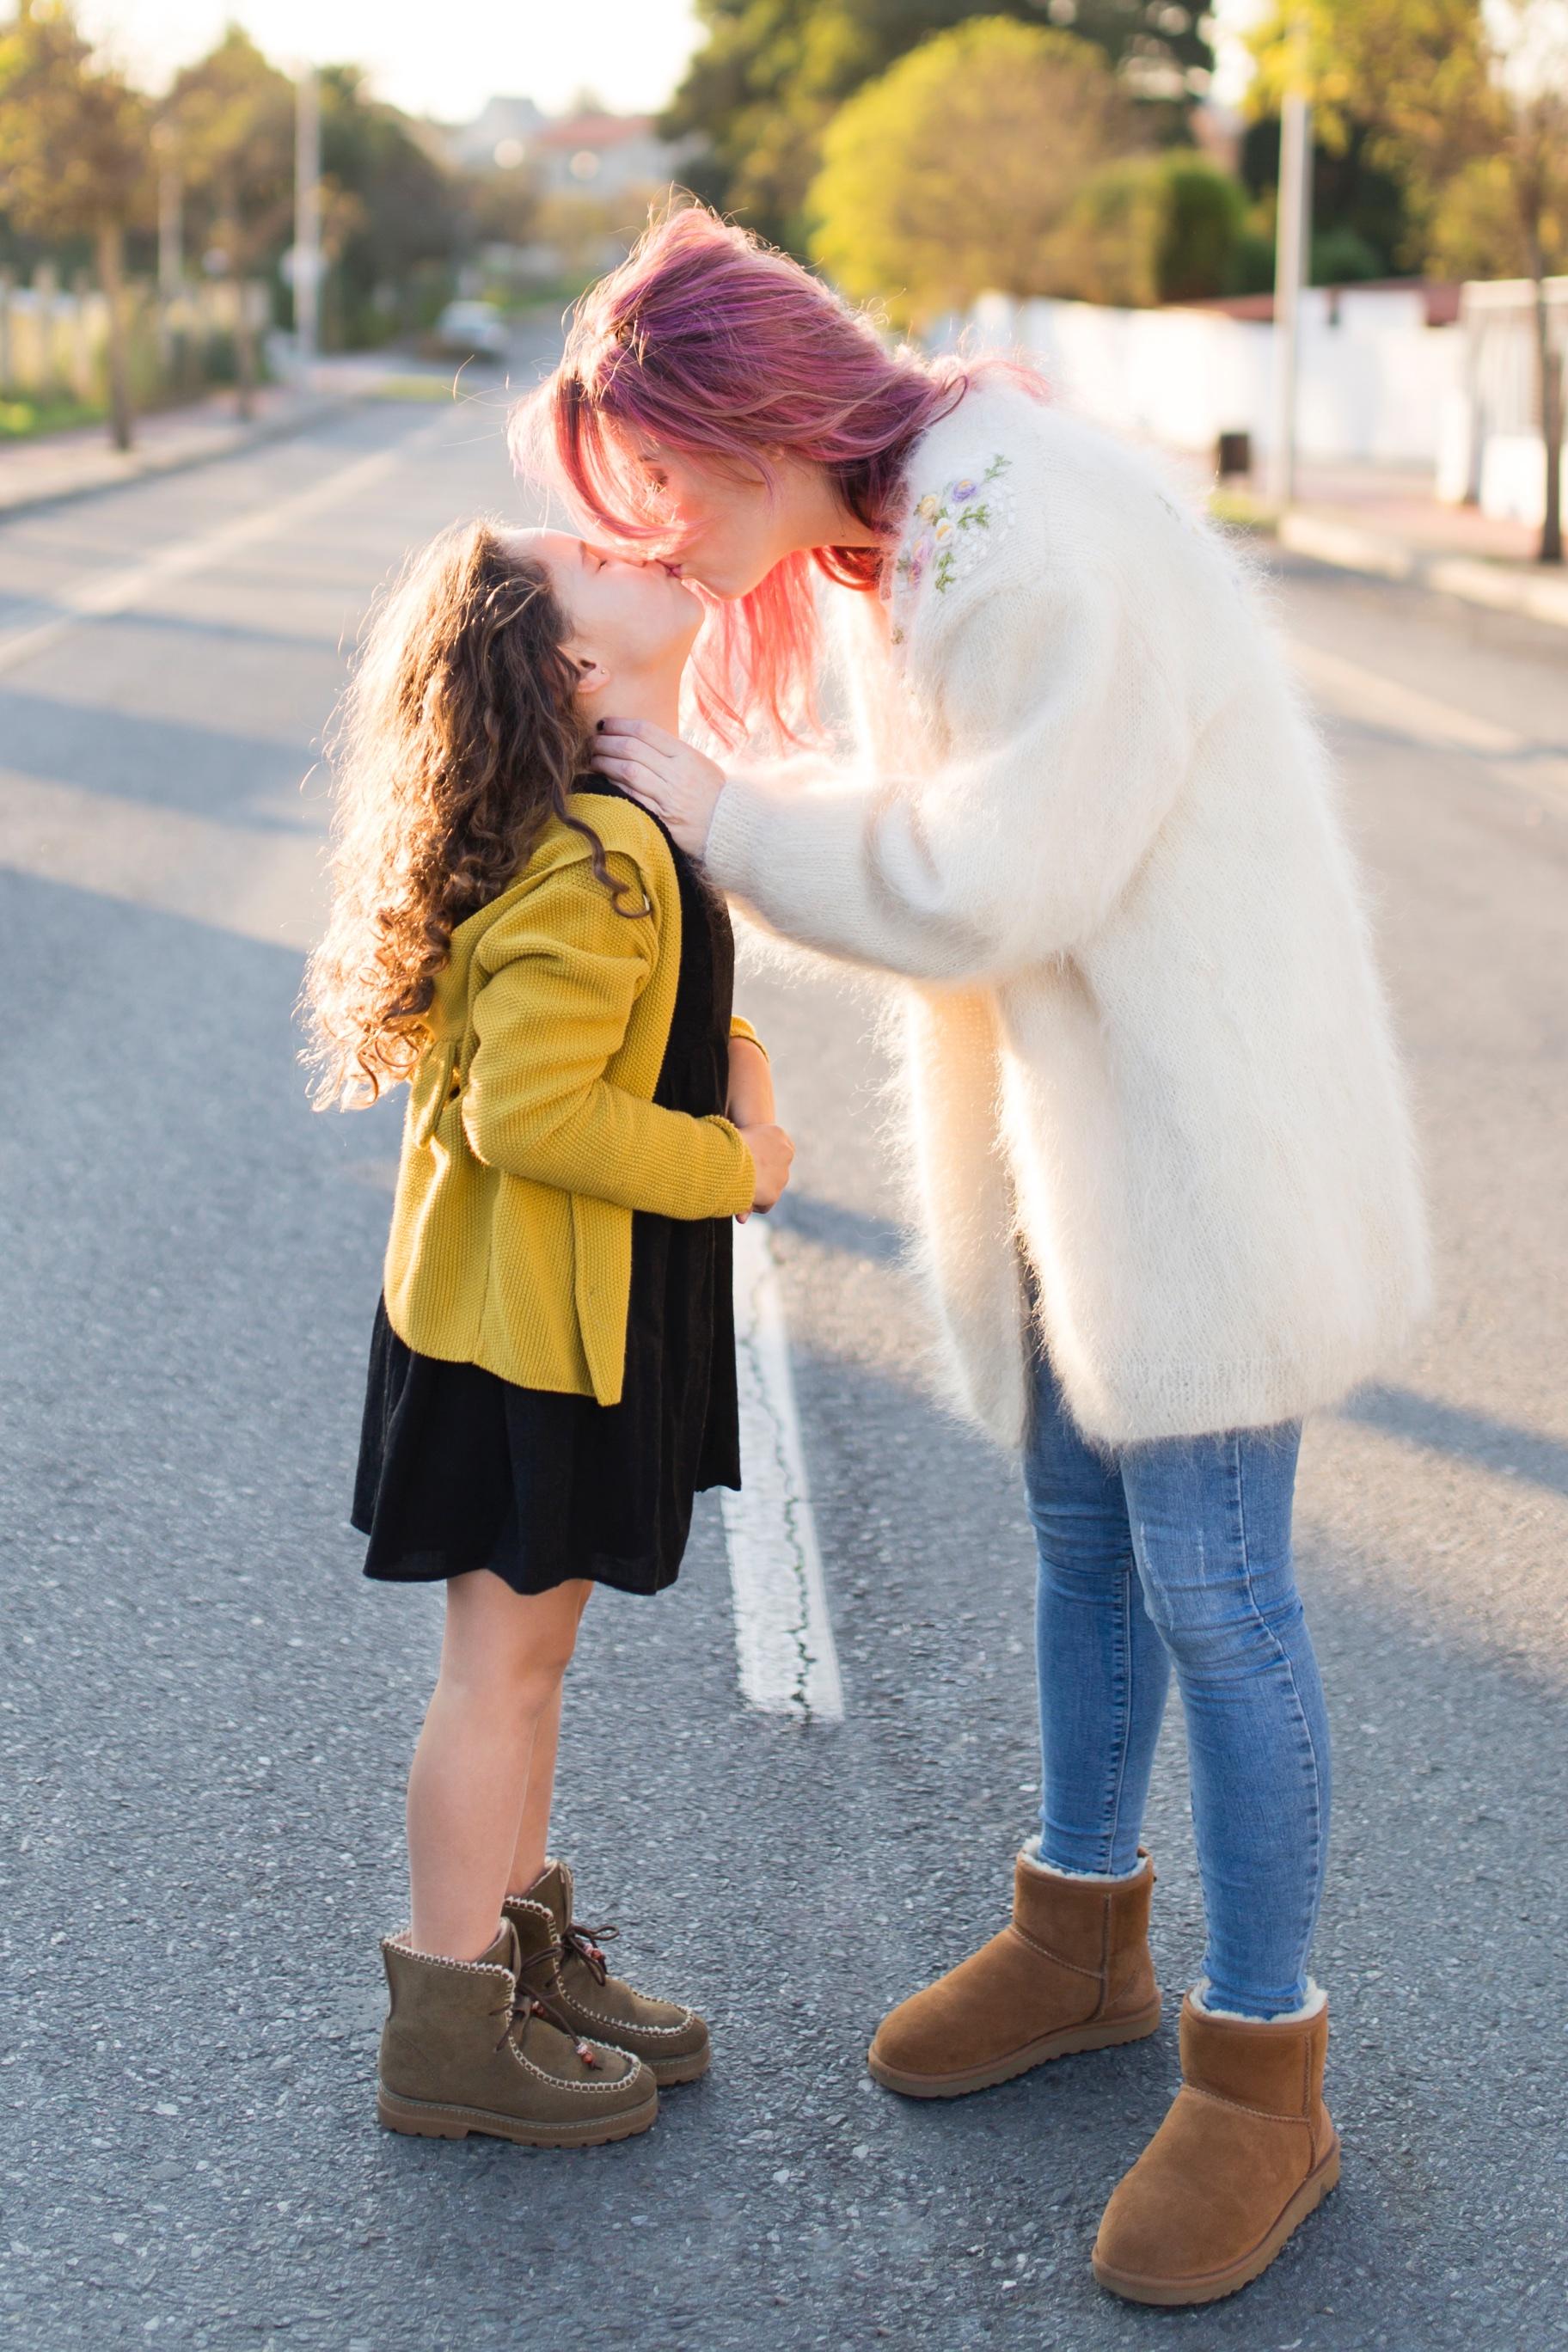 madre-e-hija-moda-descalzaporelparque-jimena-look-kids-omini-kids-ministyle-pisamonas-niños-zara-kids